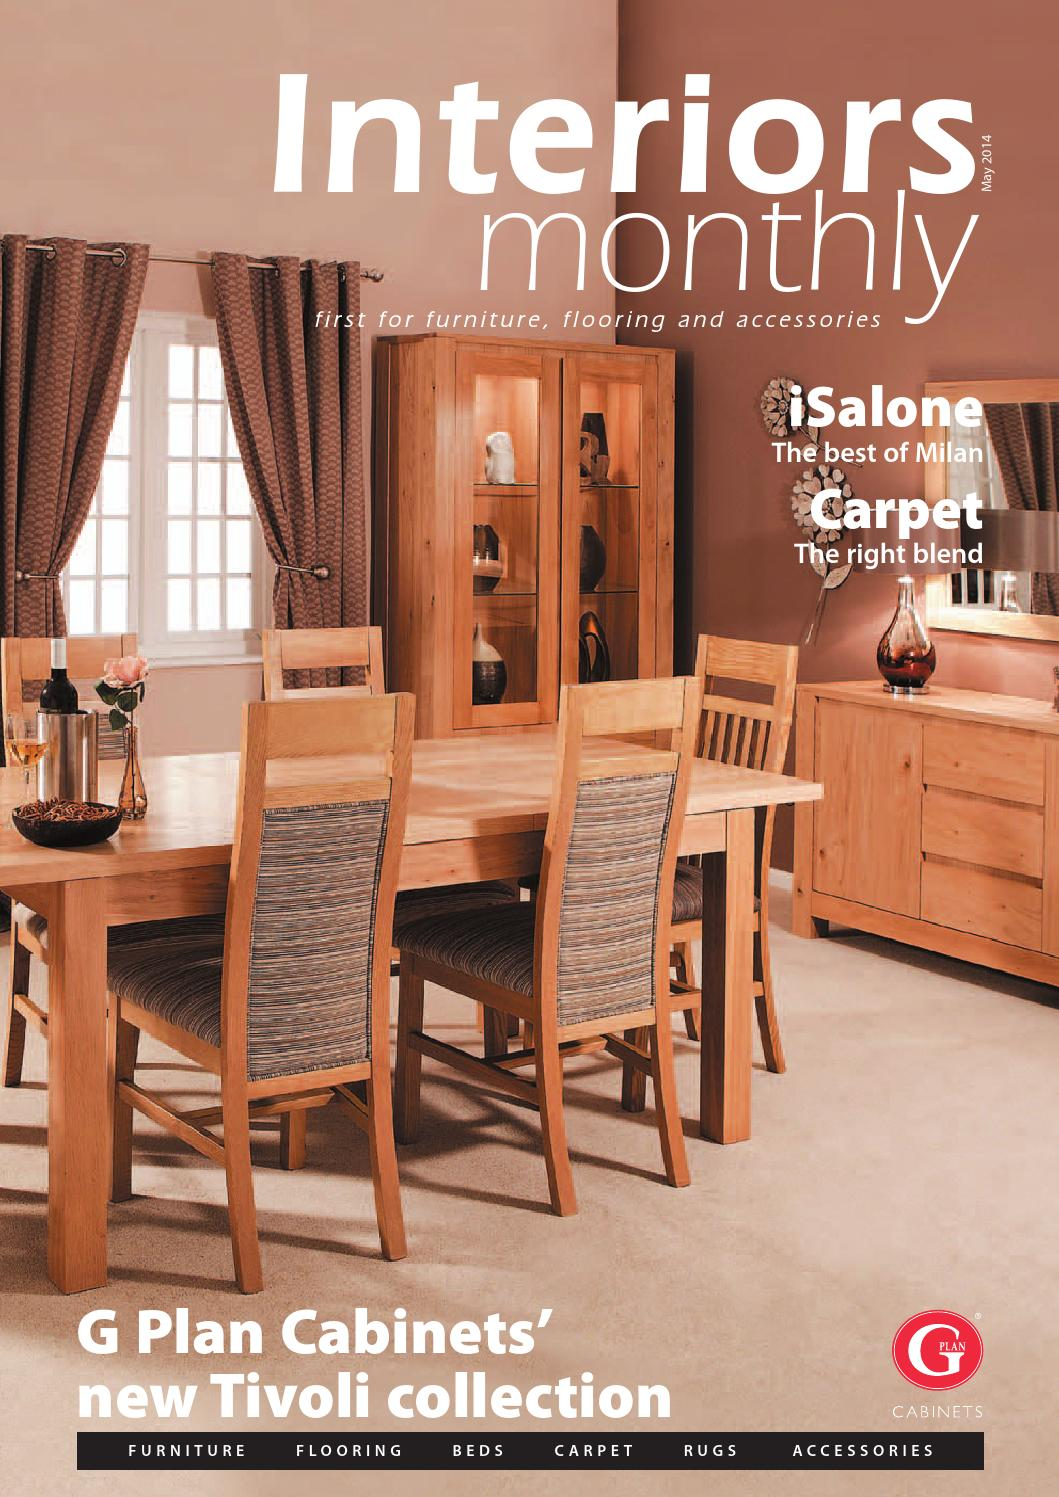 Divani Biggie Best Catalogo.Interiors Monthly May 2014 By Interiors Monthly Issuu